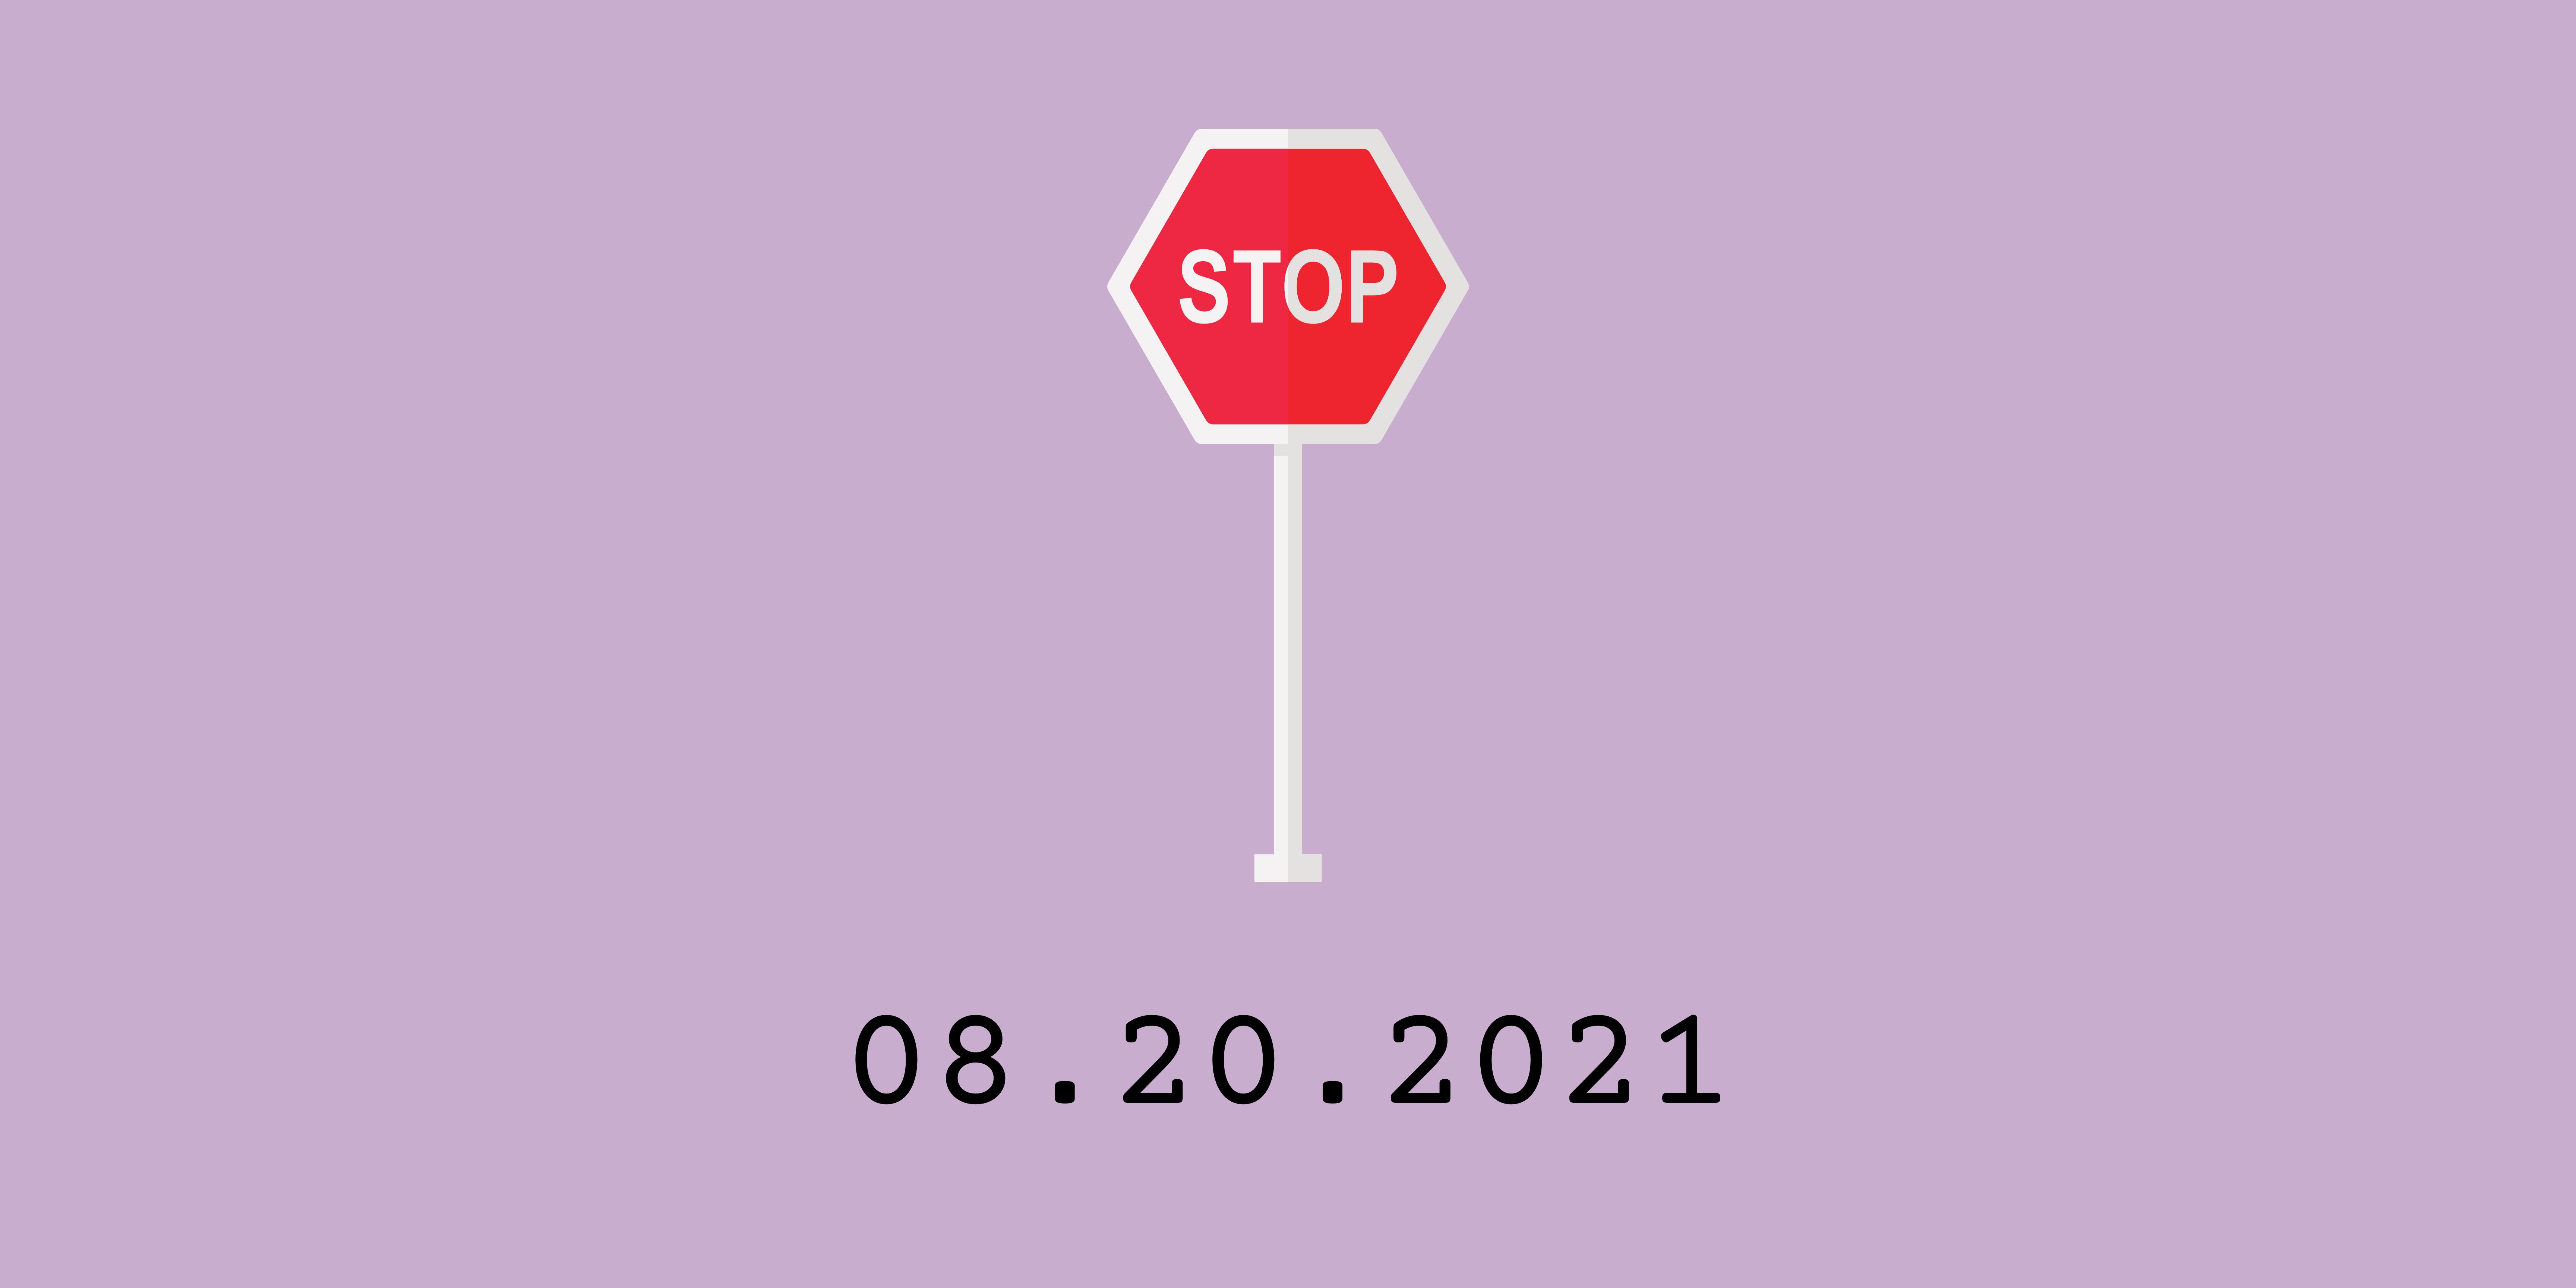 08.20.2021